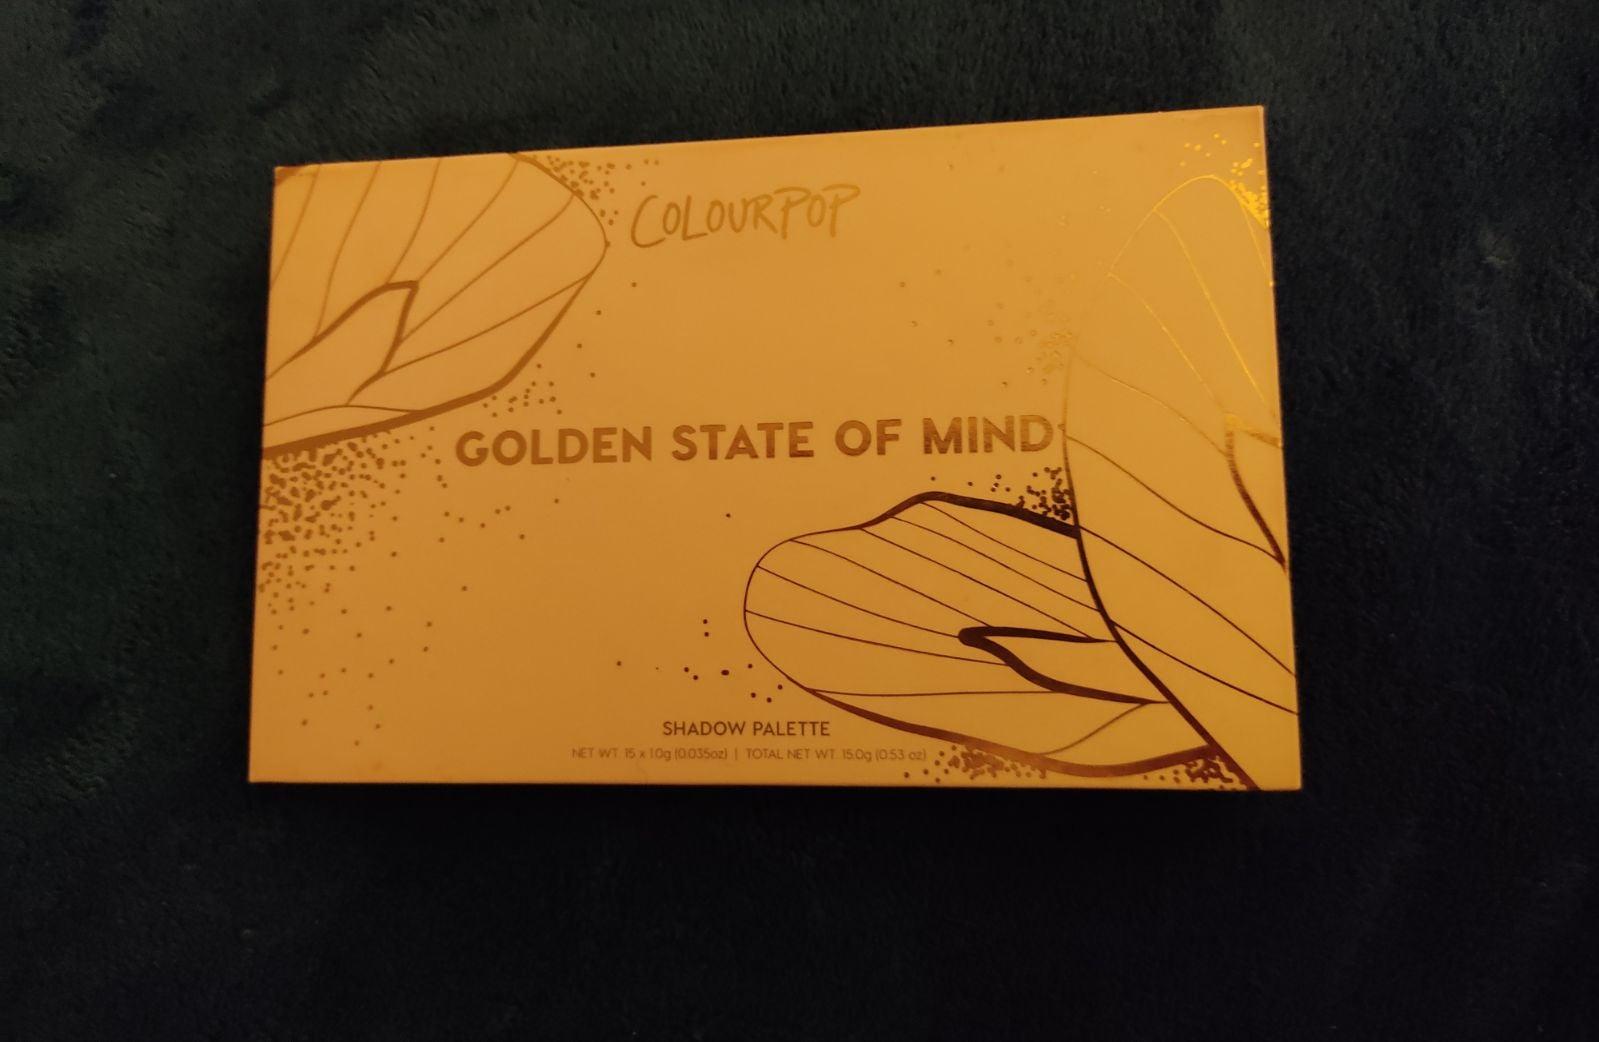 Colourpop Golden State of Mind